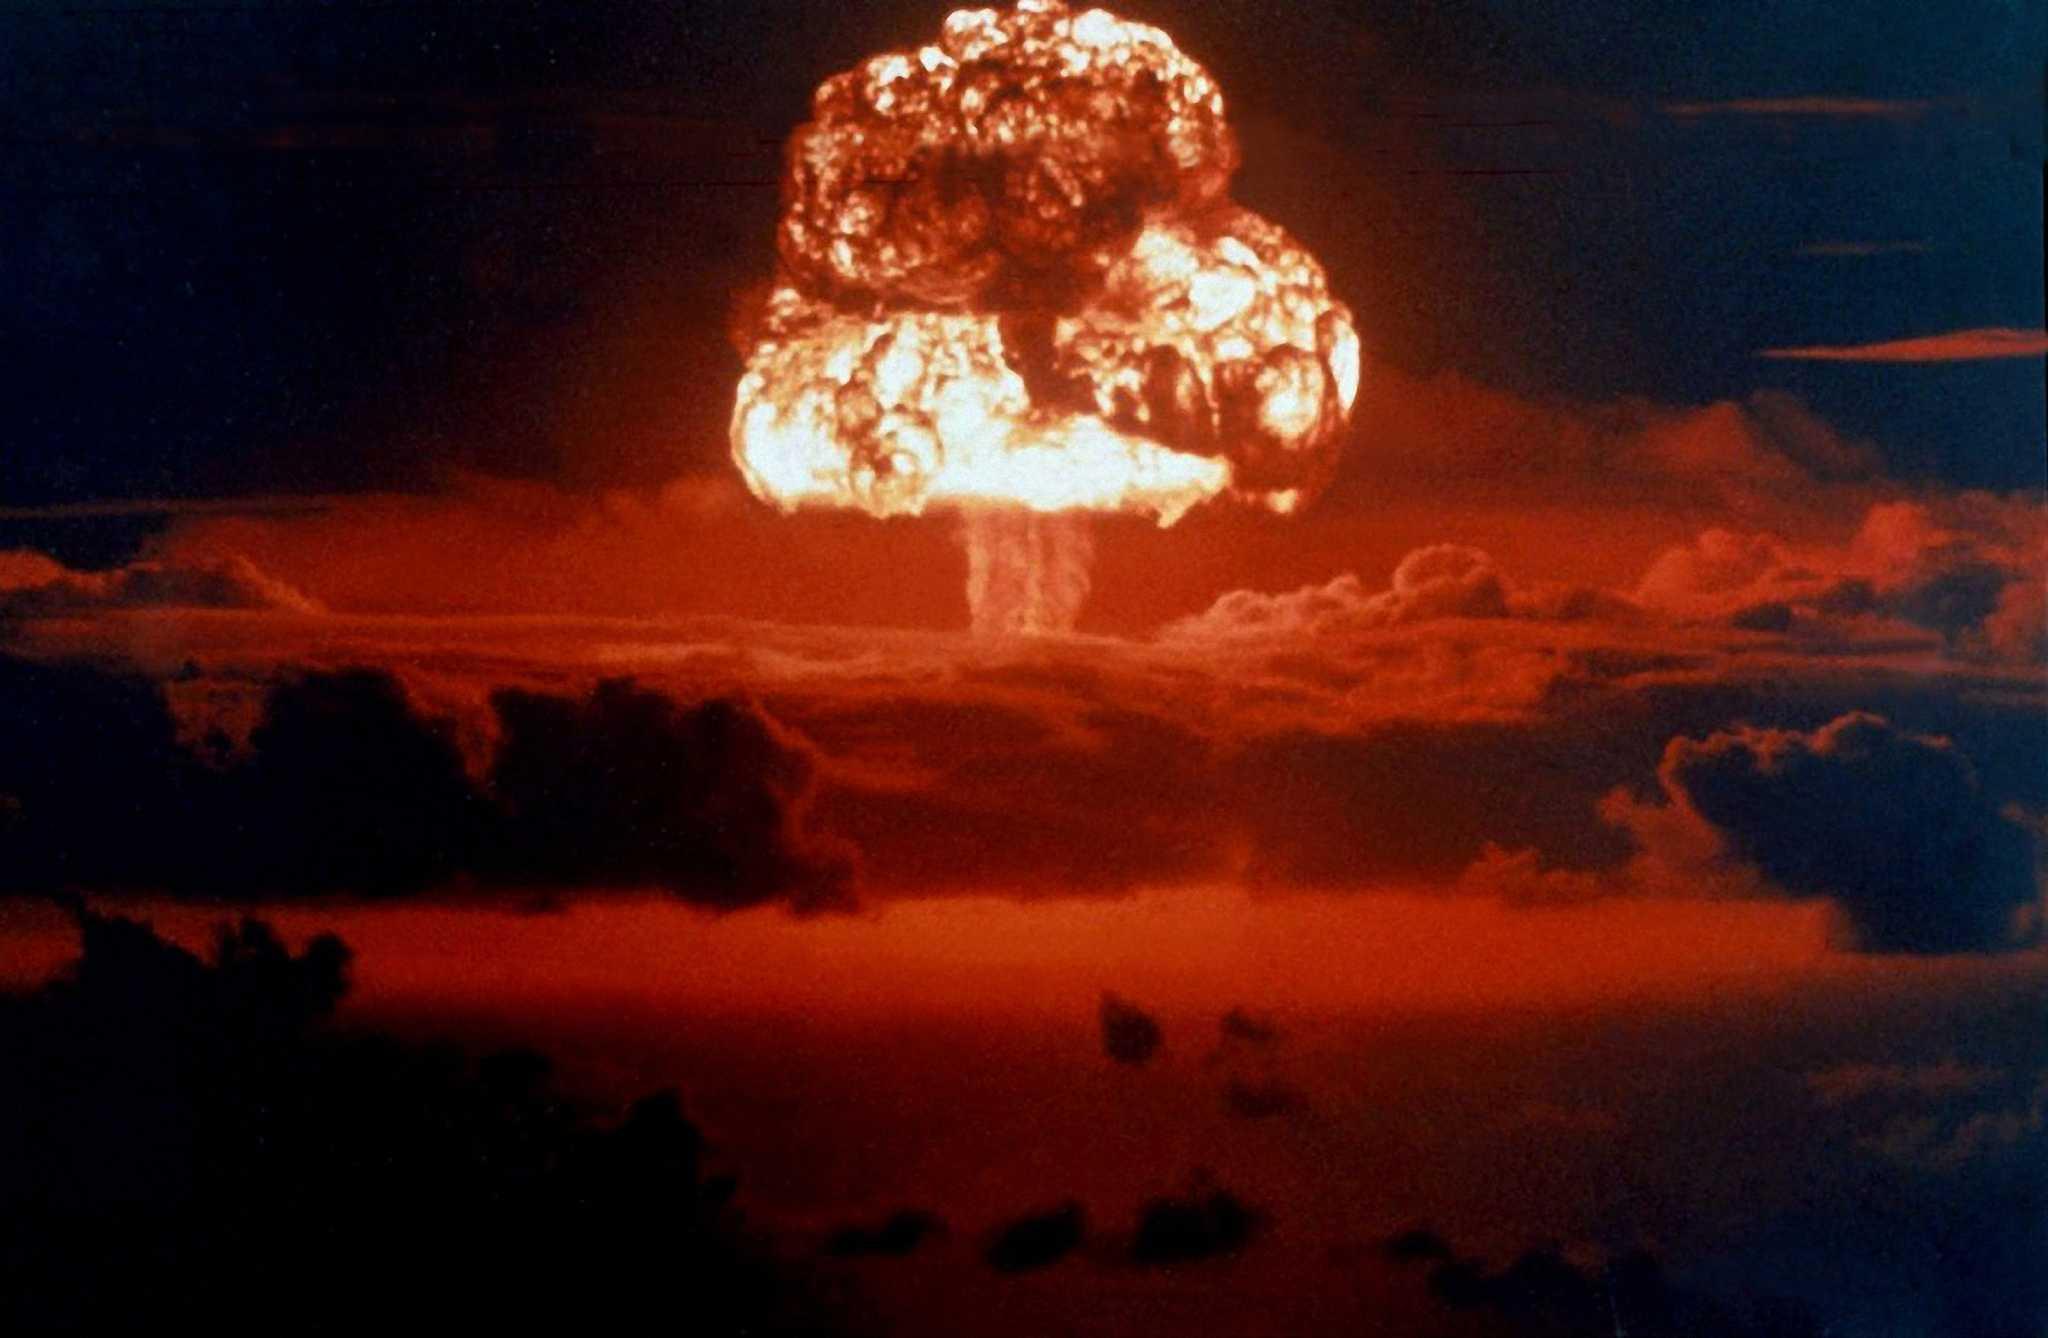 cruz says president trump would nuke houston chronicle